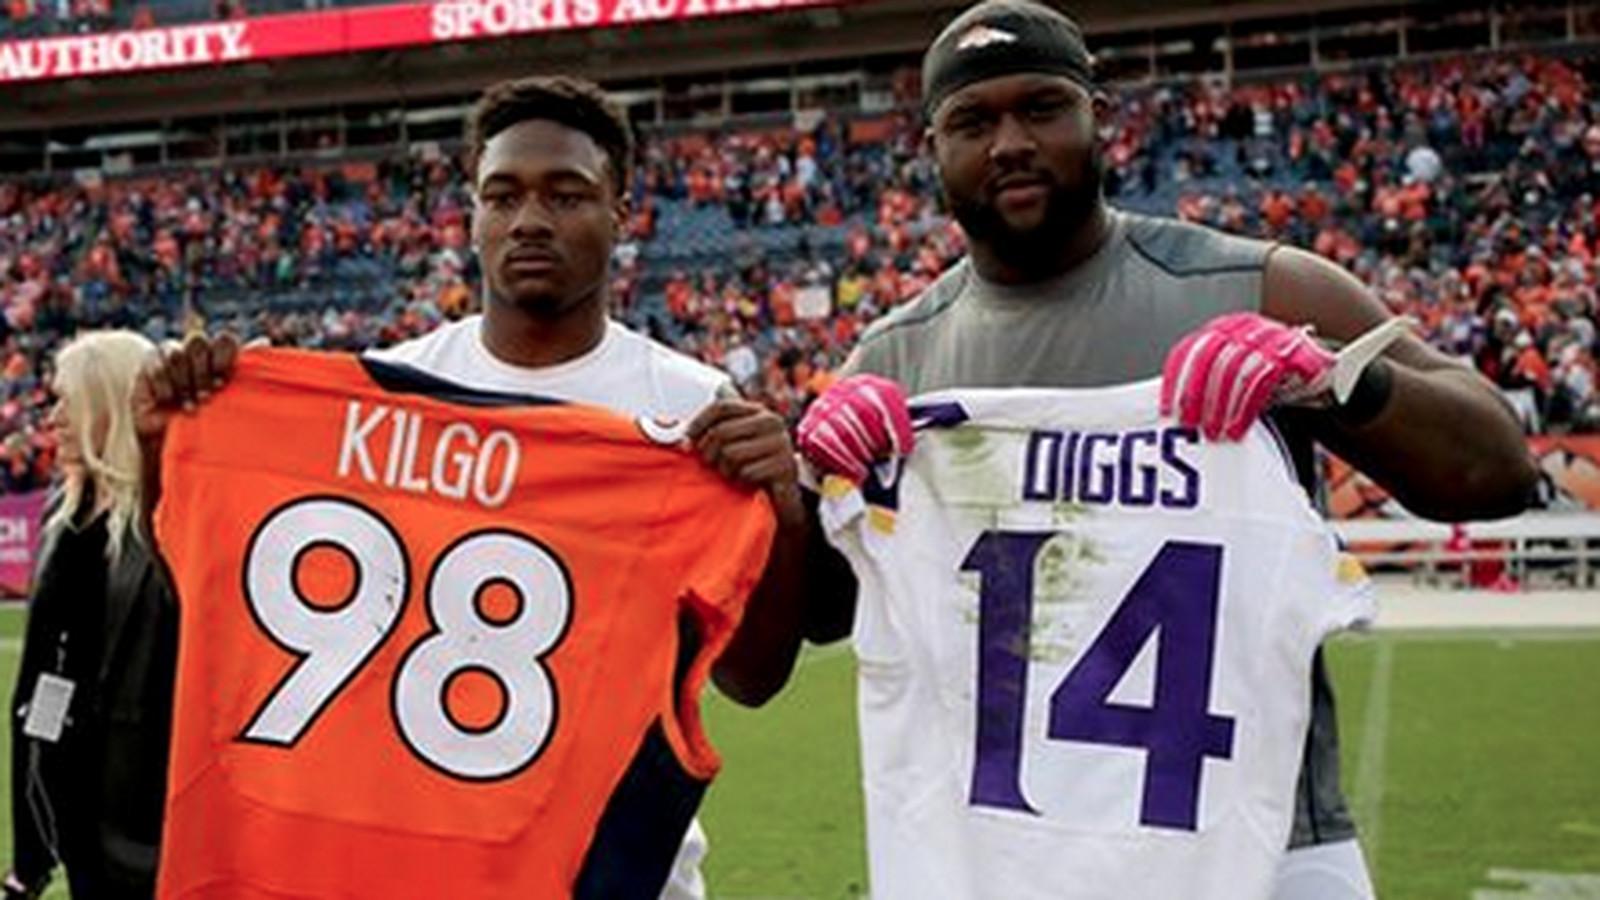 Stefon Diggs and Darius Kilgo swapped jerseys after Sunday's ...